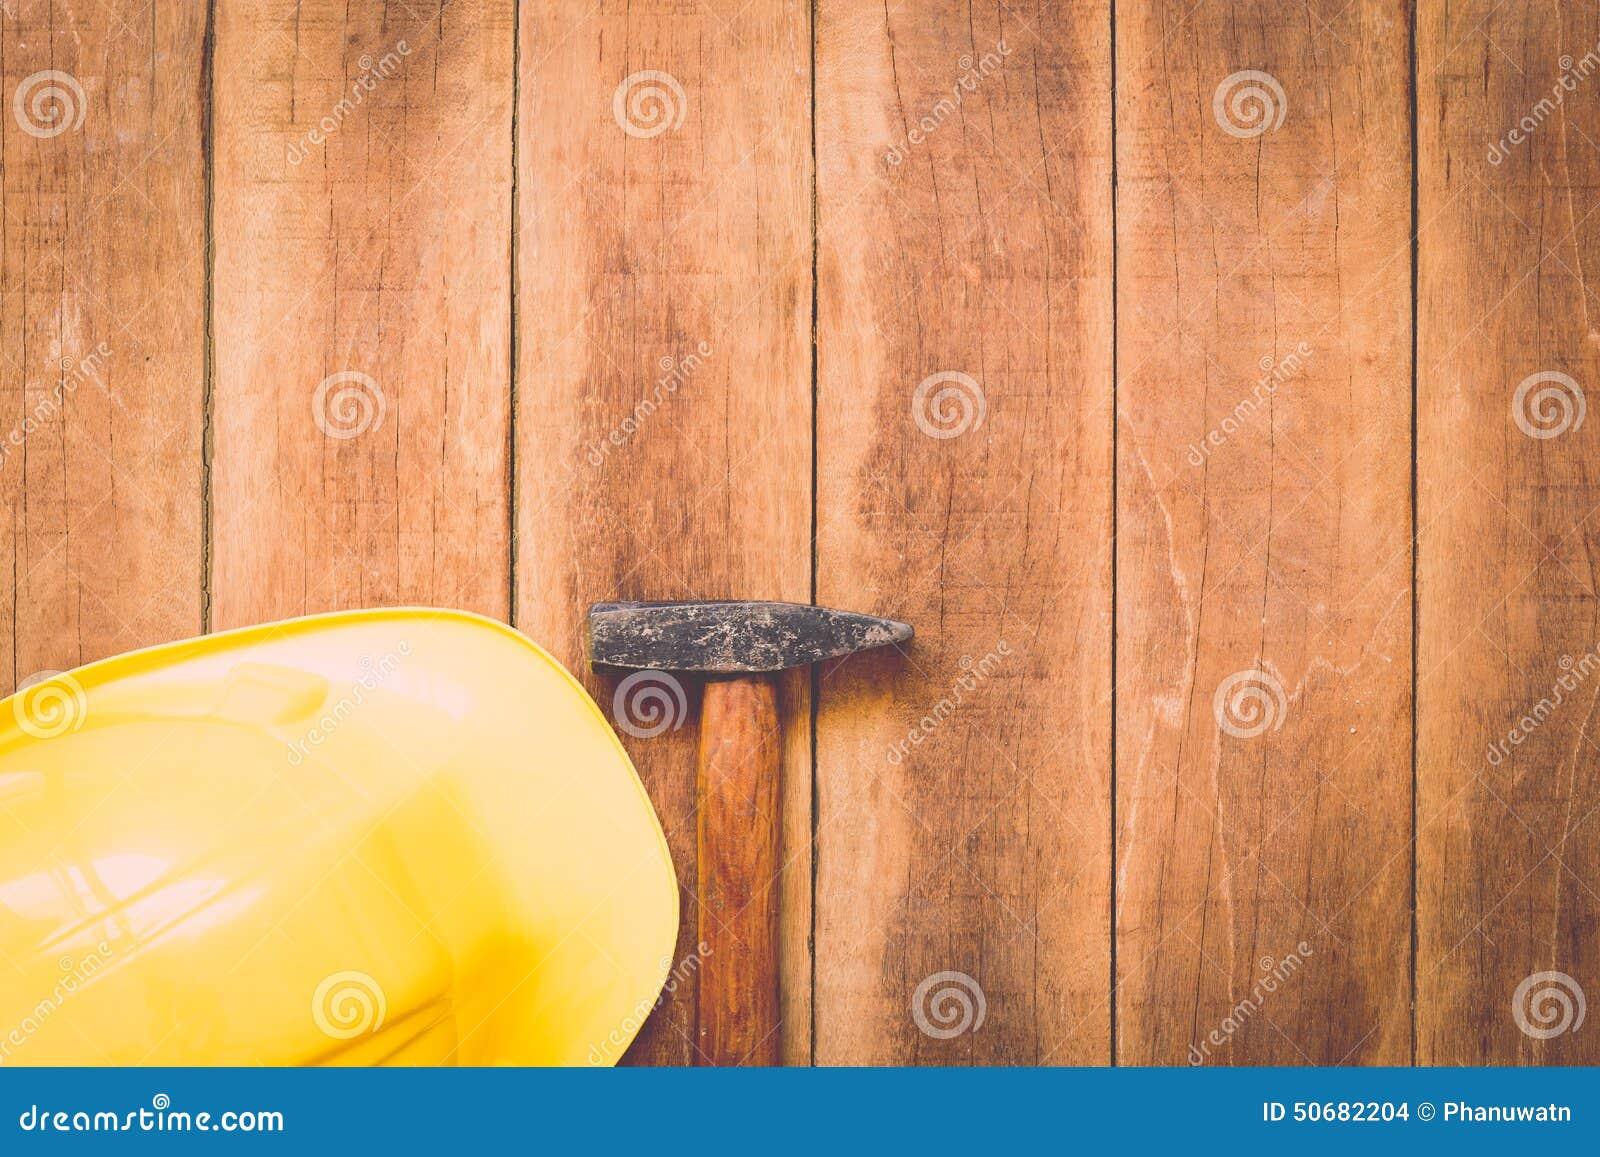 Download 在木头的被分类的工作工具 库存照片. 图片 包括有 现有量, 概念, 钉子, 的协助, 甲板, 投反对票 - 50682204